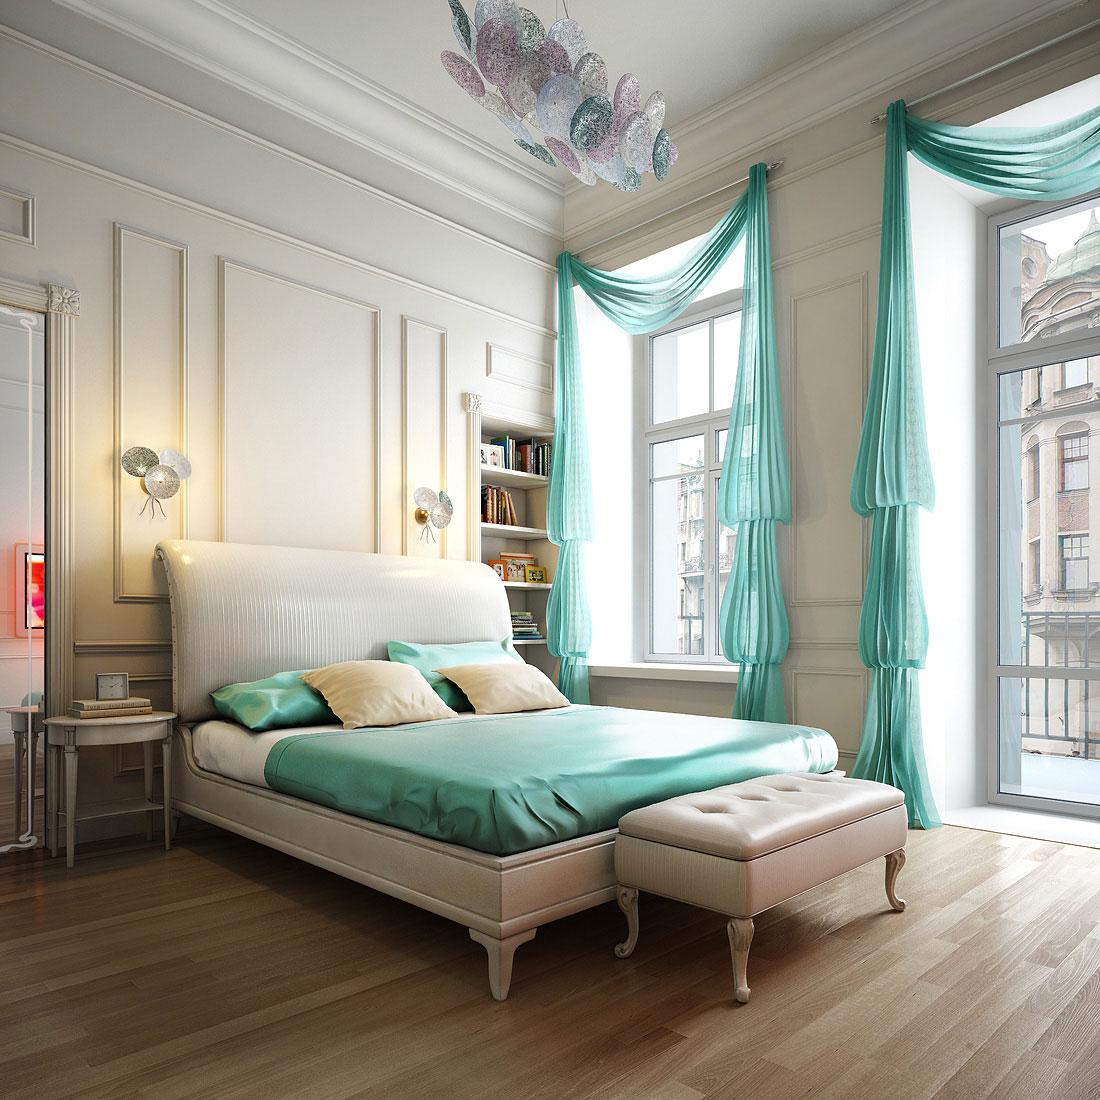 Apartment Bedroom Decor - Ikea Small Kitchen Ideas